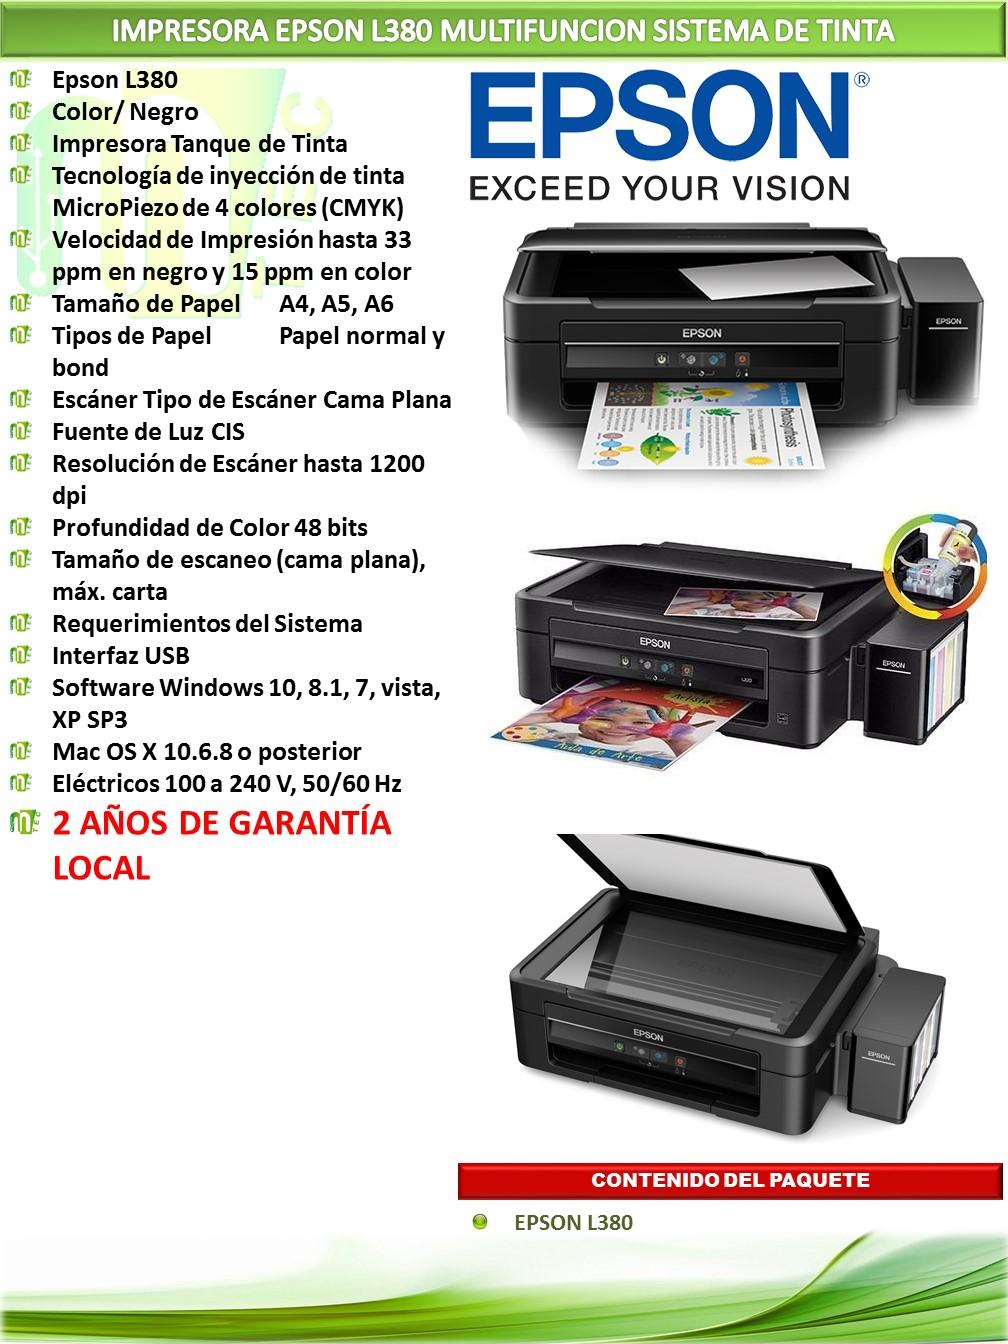 Epson L380 Impresora Multifunci 243 N Sistema De Tinta Mtec